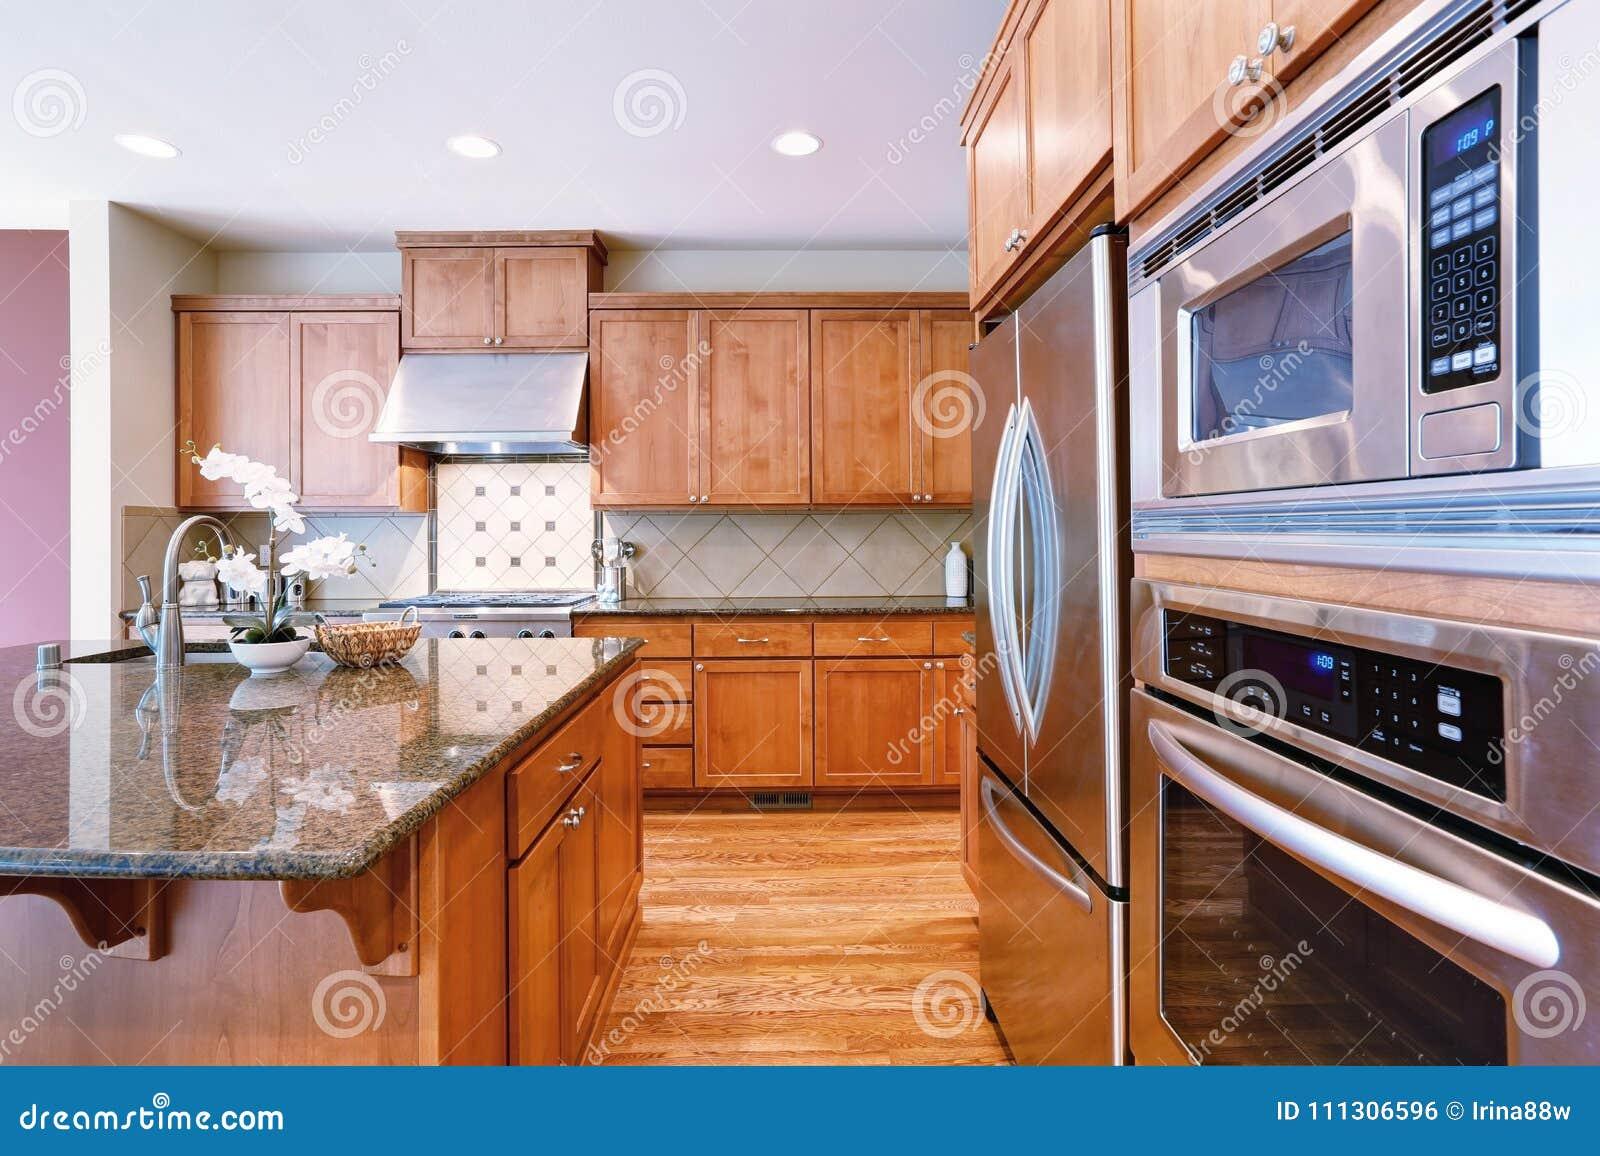 La cuisine de invitation lumineuse comporte des compteurs de granit